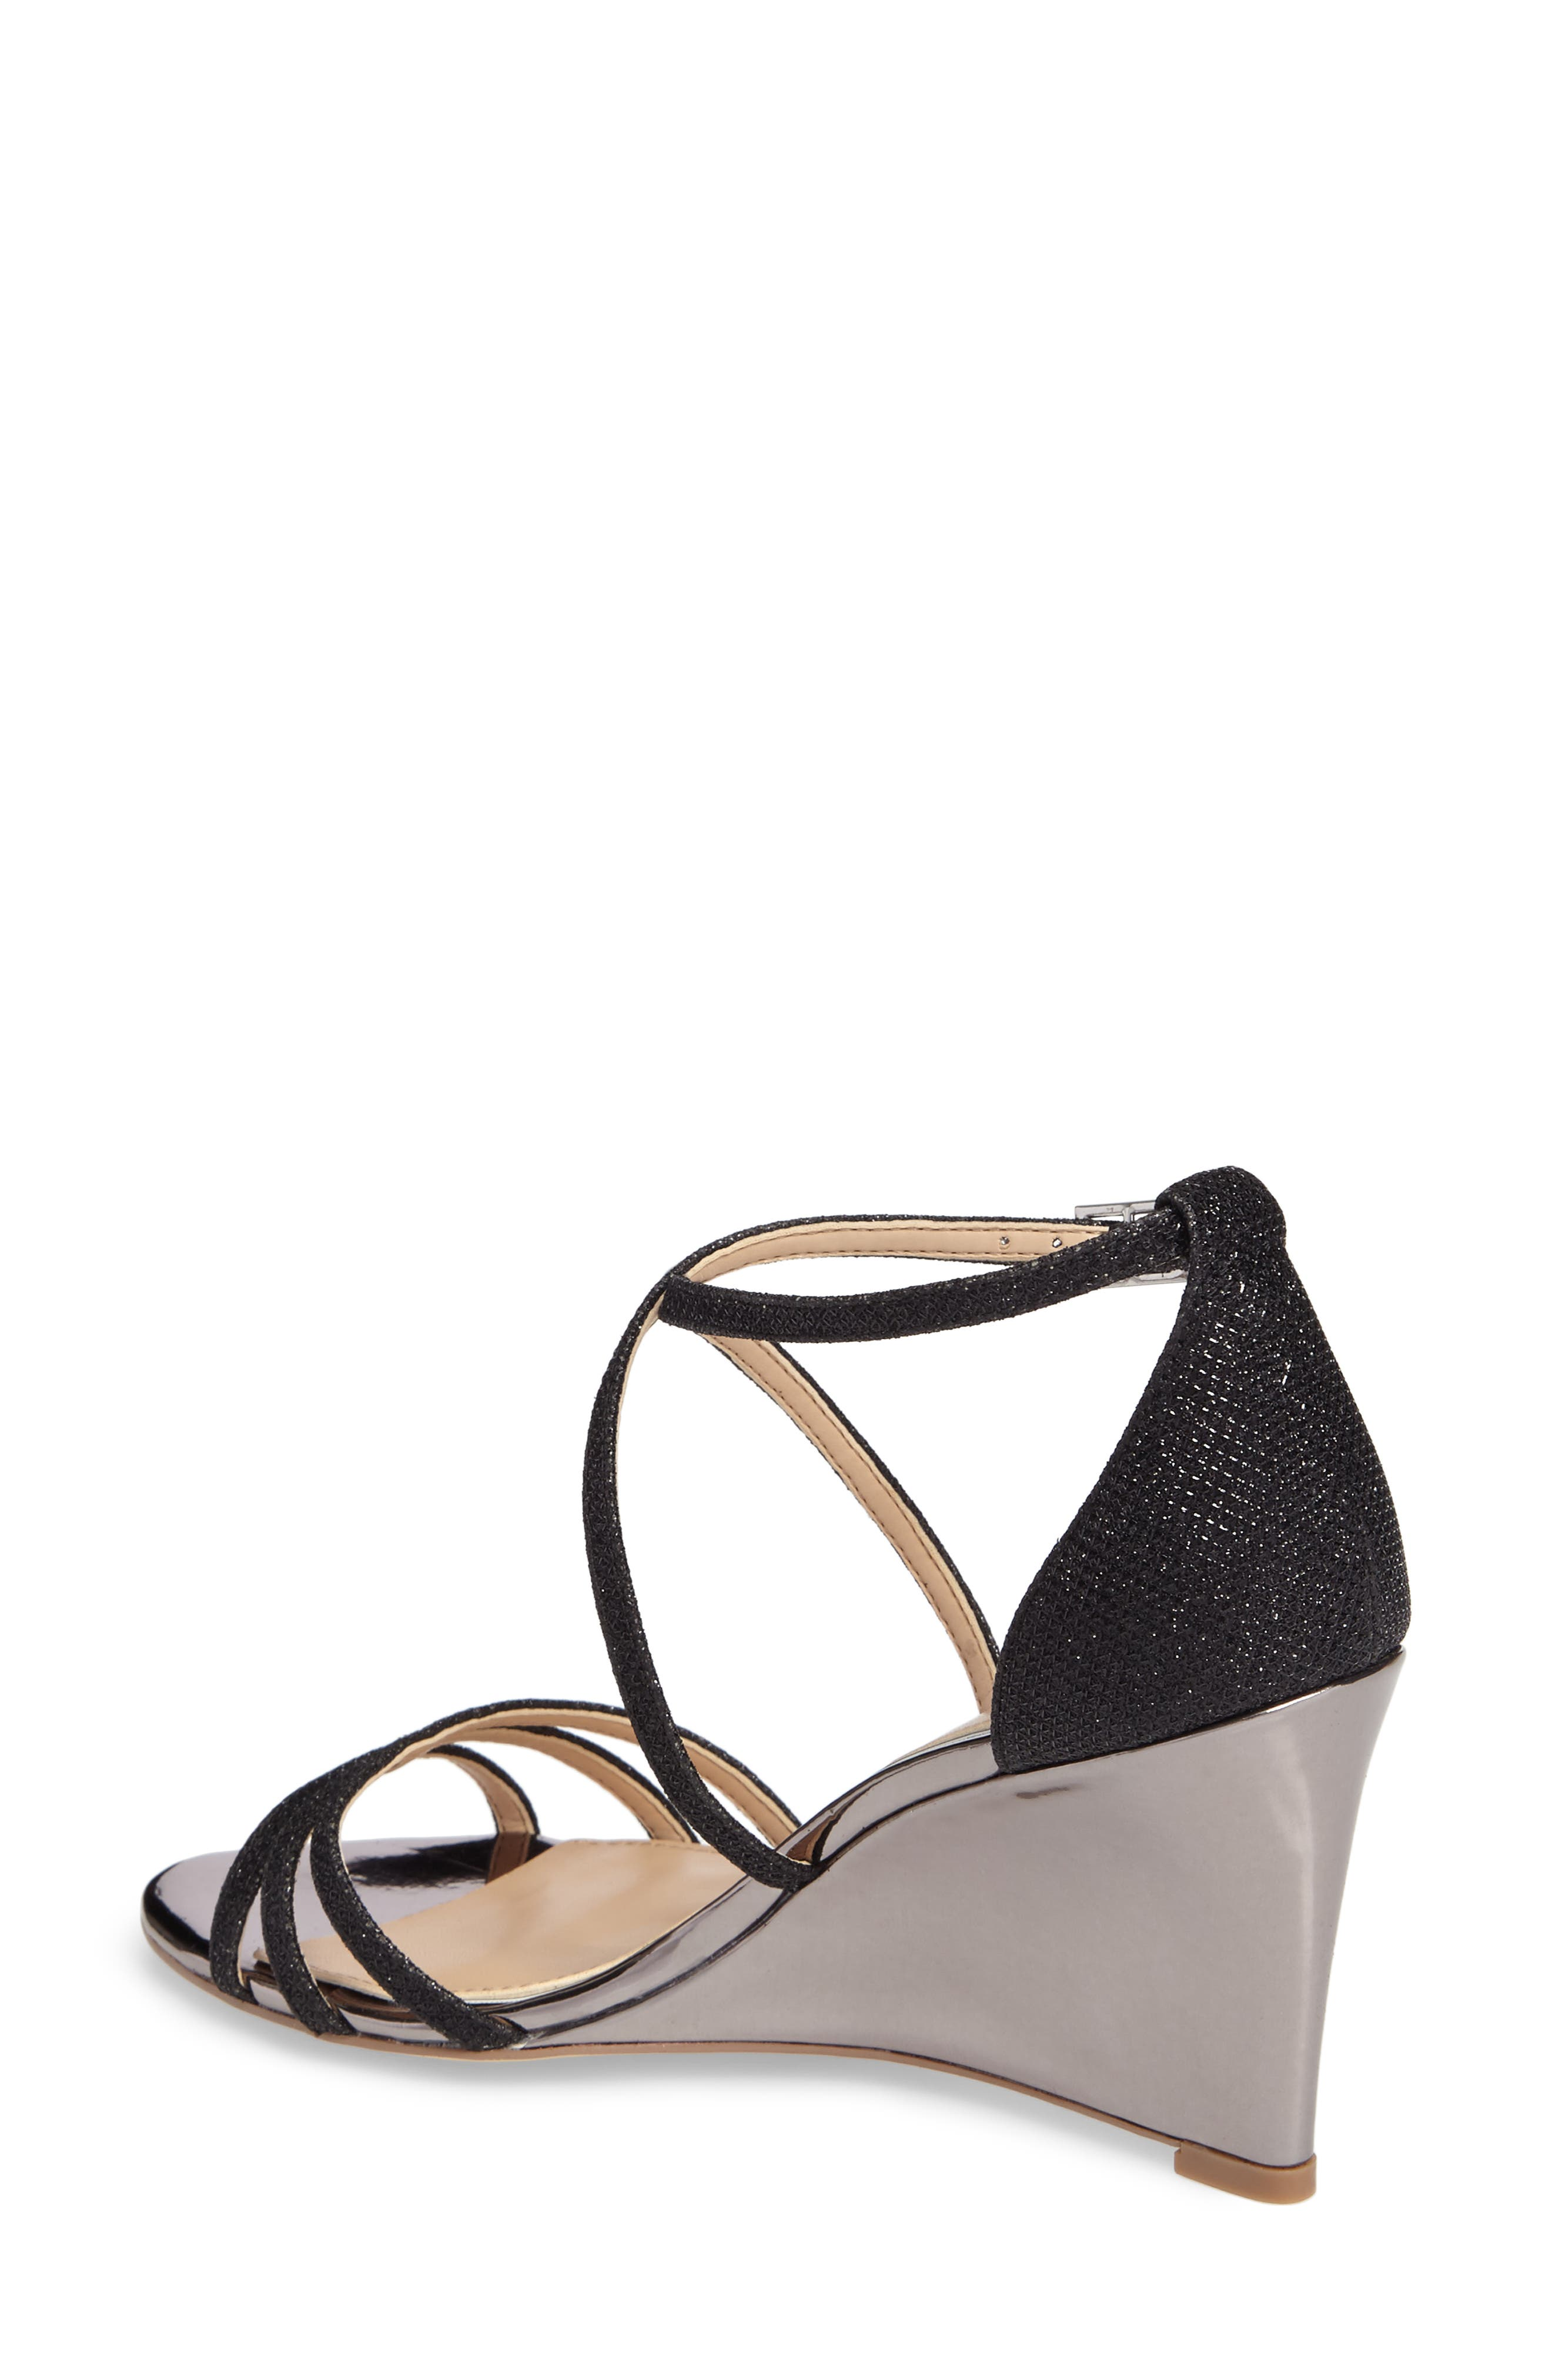 Alternate Image 2  - Jewel Badgley Mischka Hunt Glittery Wedge Sandal (Women)